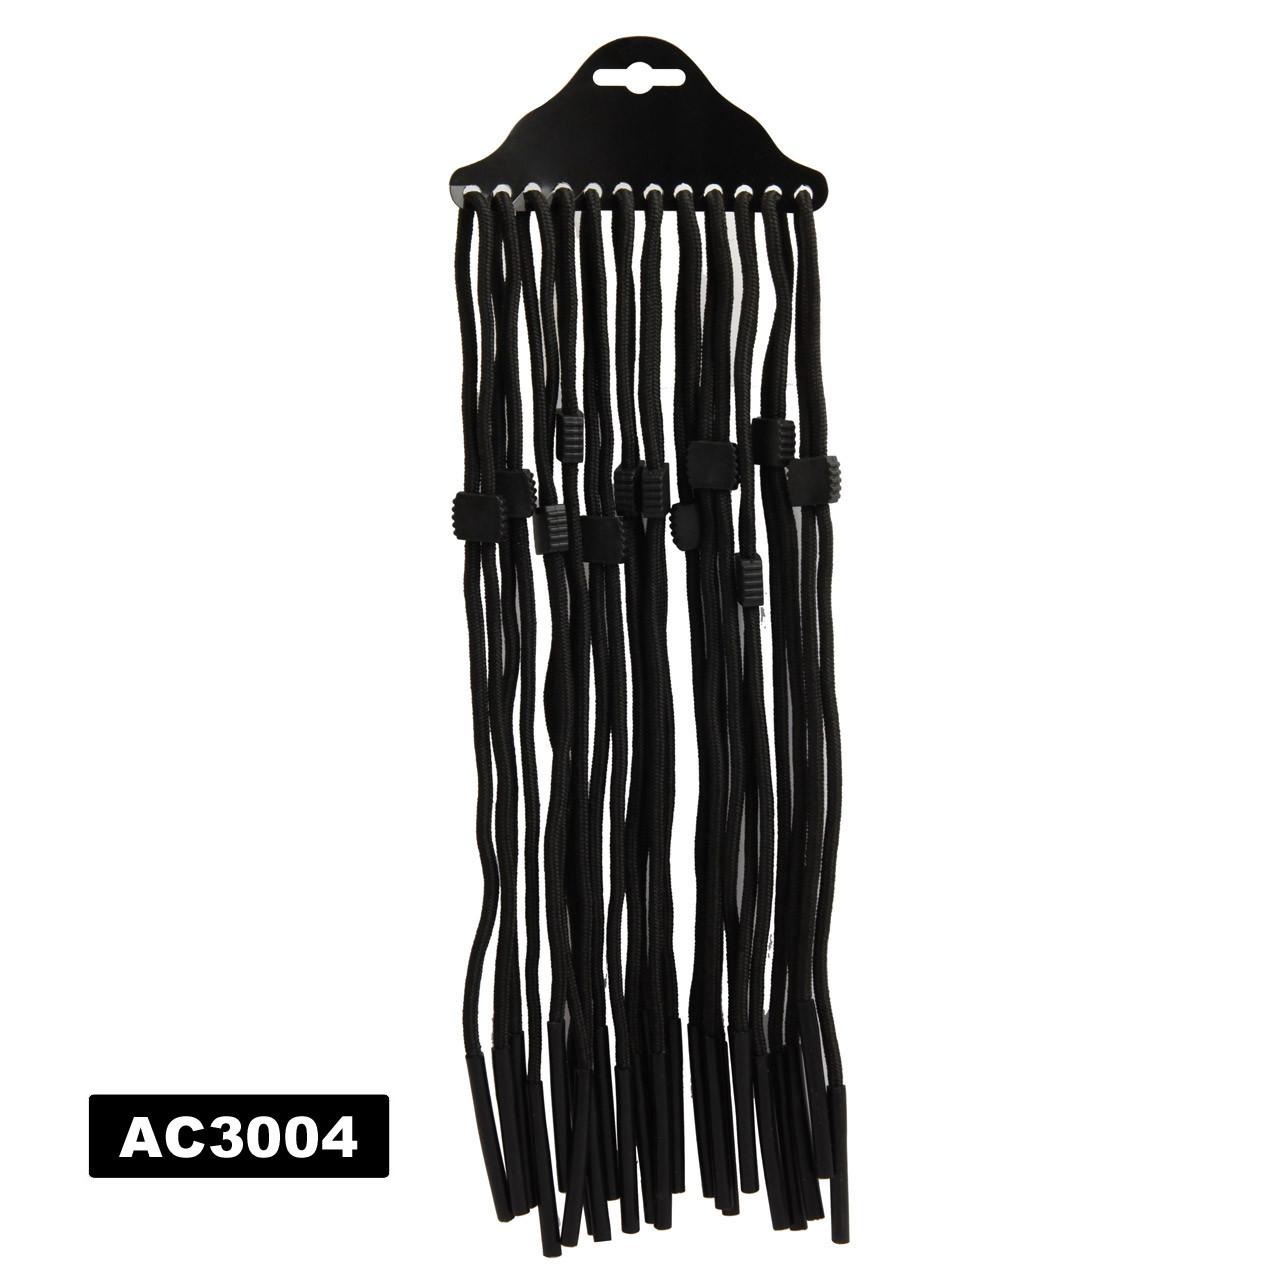 Adjustable Wholesale Sunglass Straps - AC3004